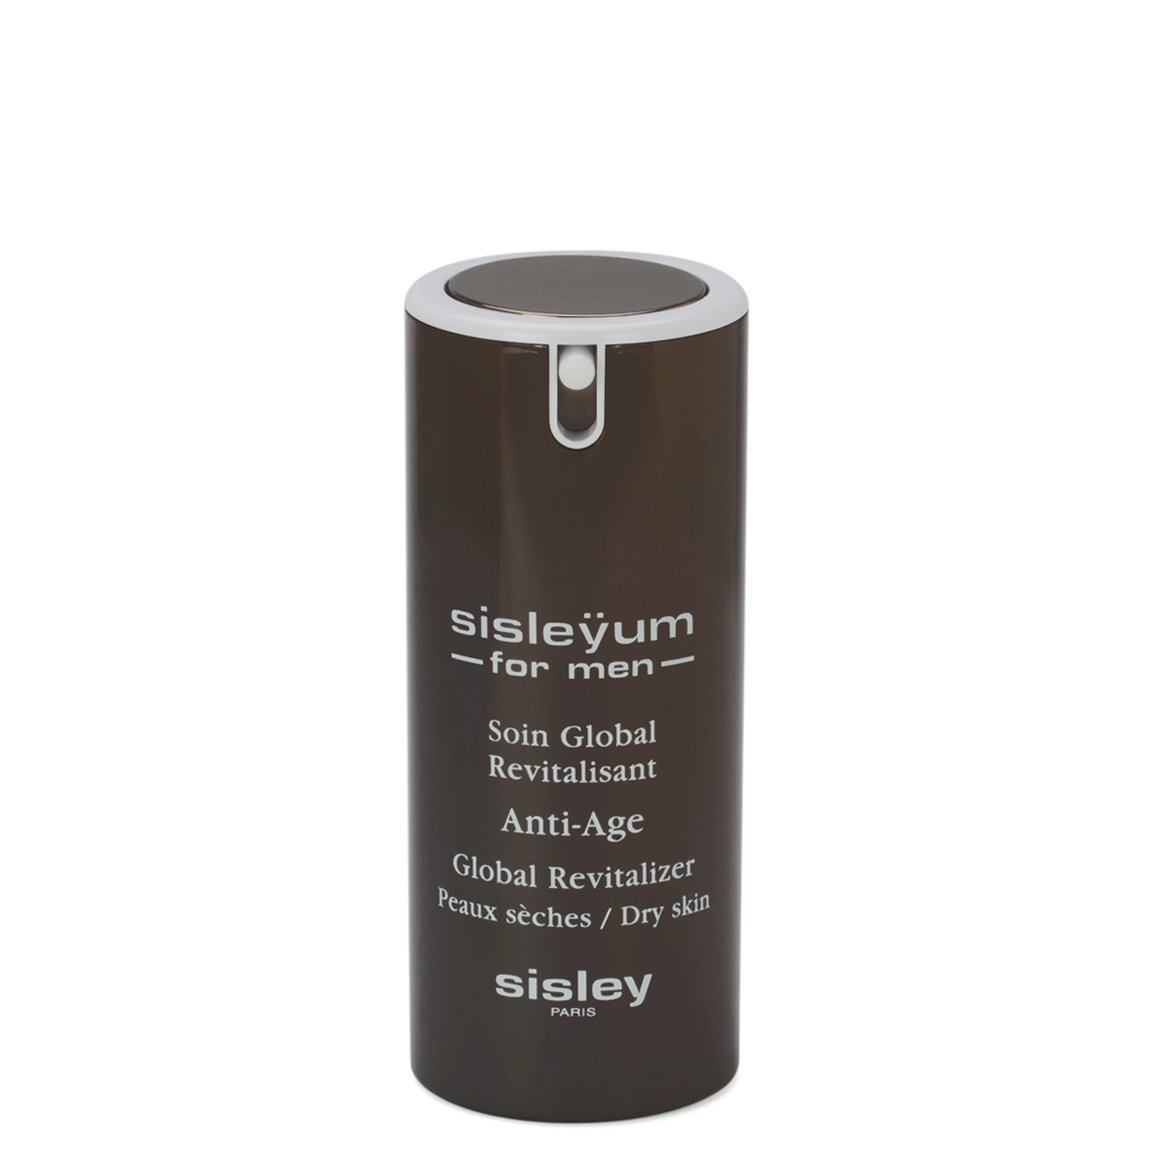 Sisley-Paris Sisleÿum for Men (Dry) alternative view 1 - product swatch.